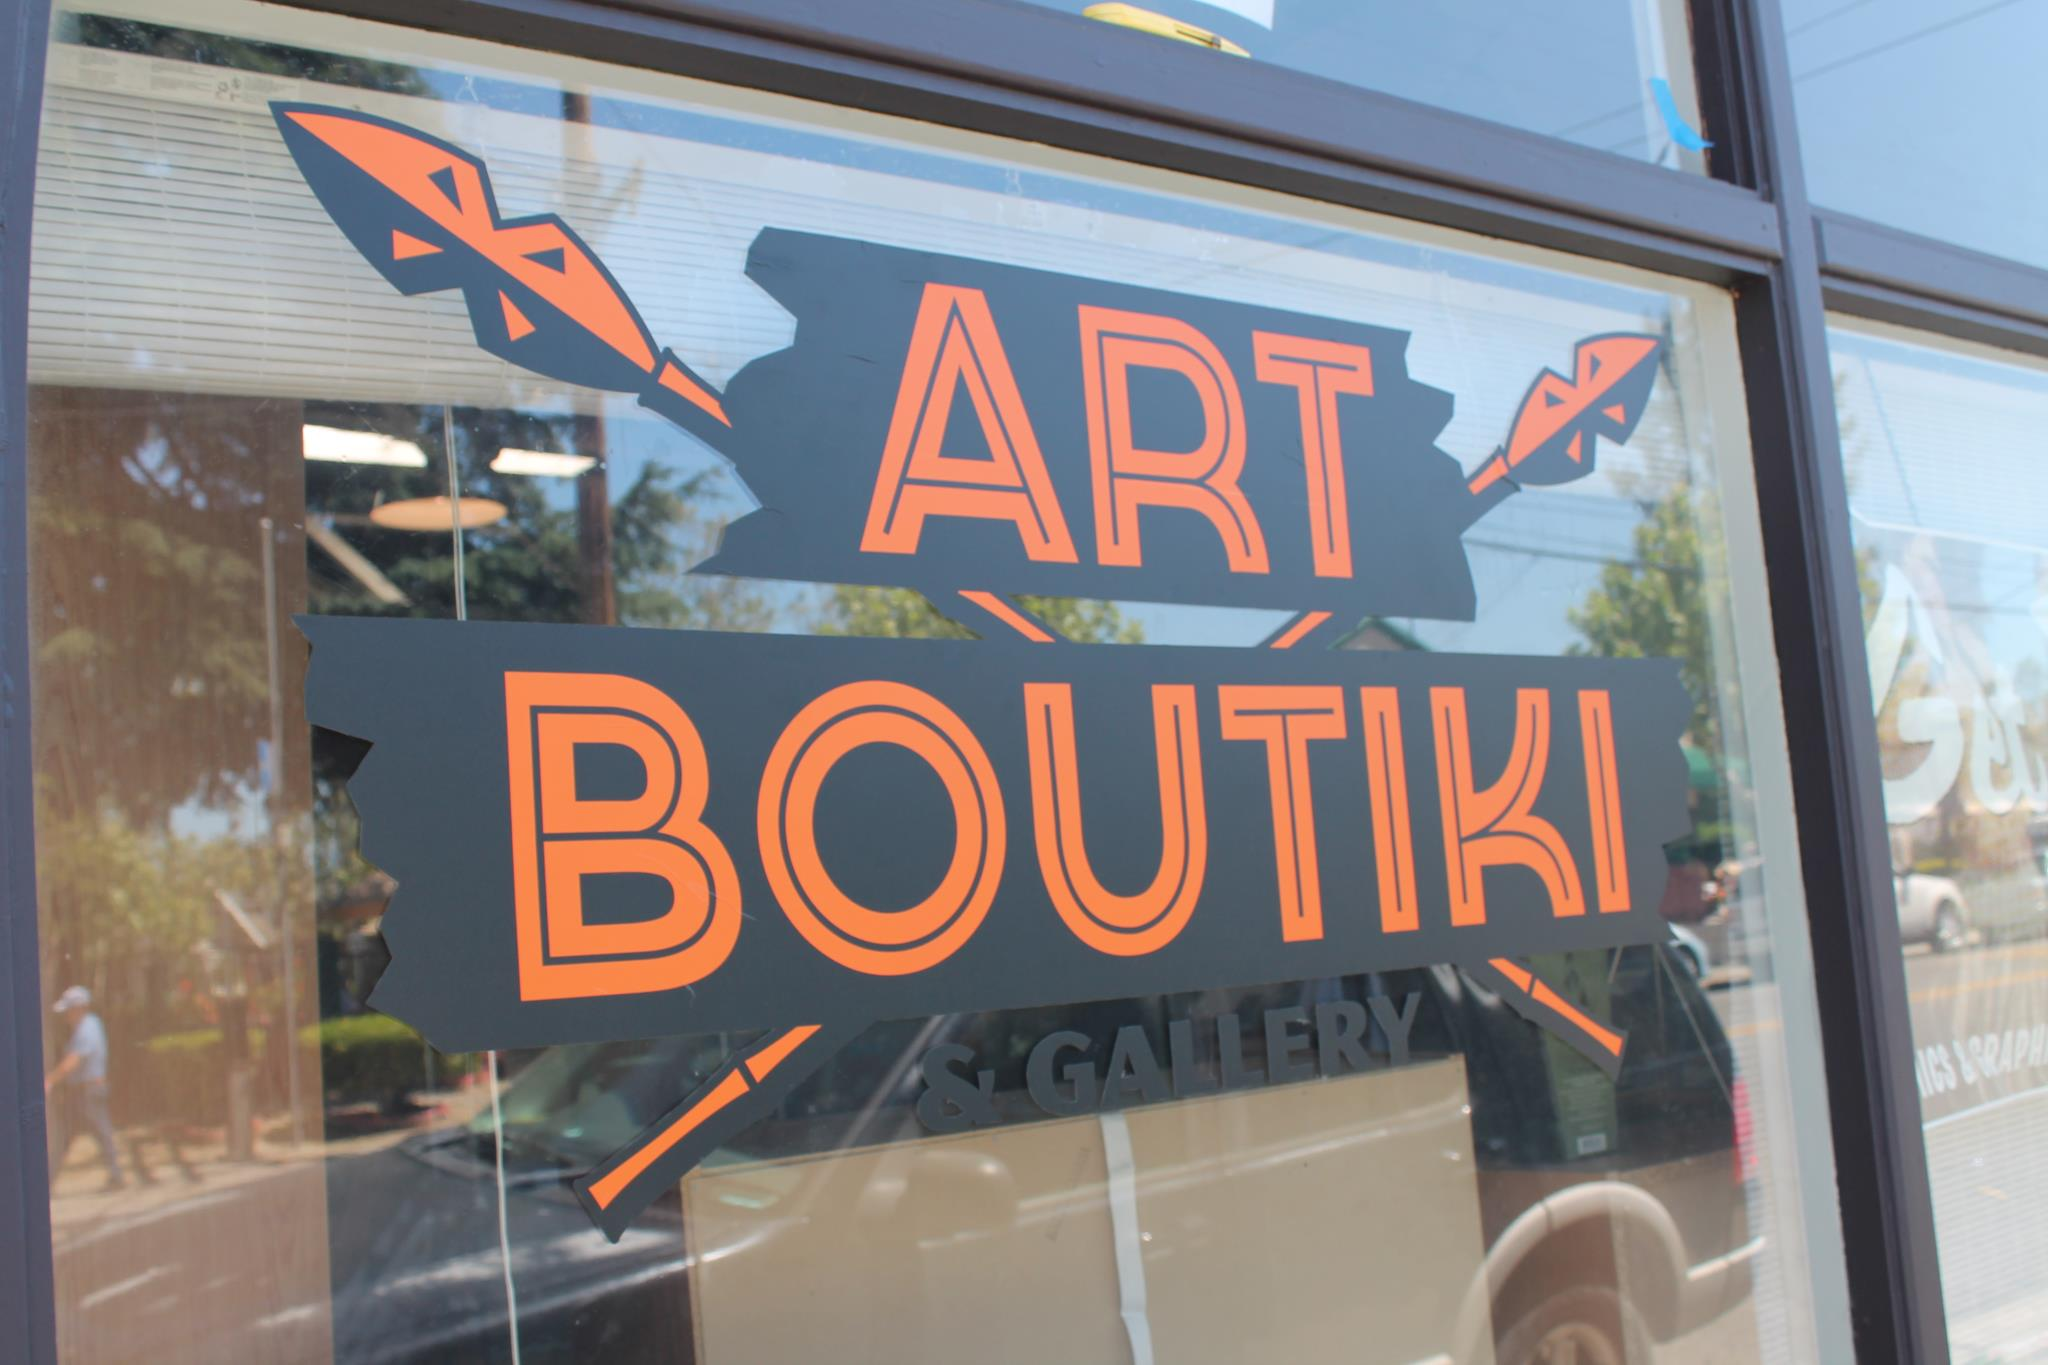 boutiki_front_glass.jpg